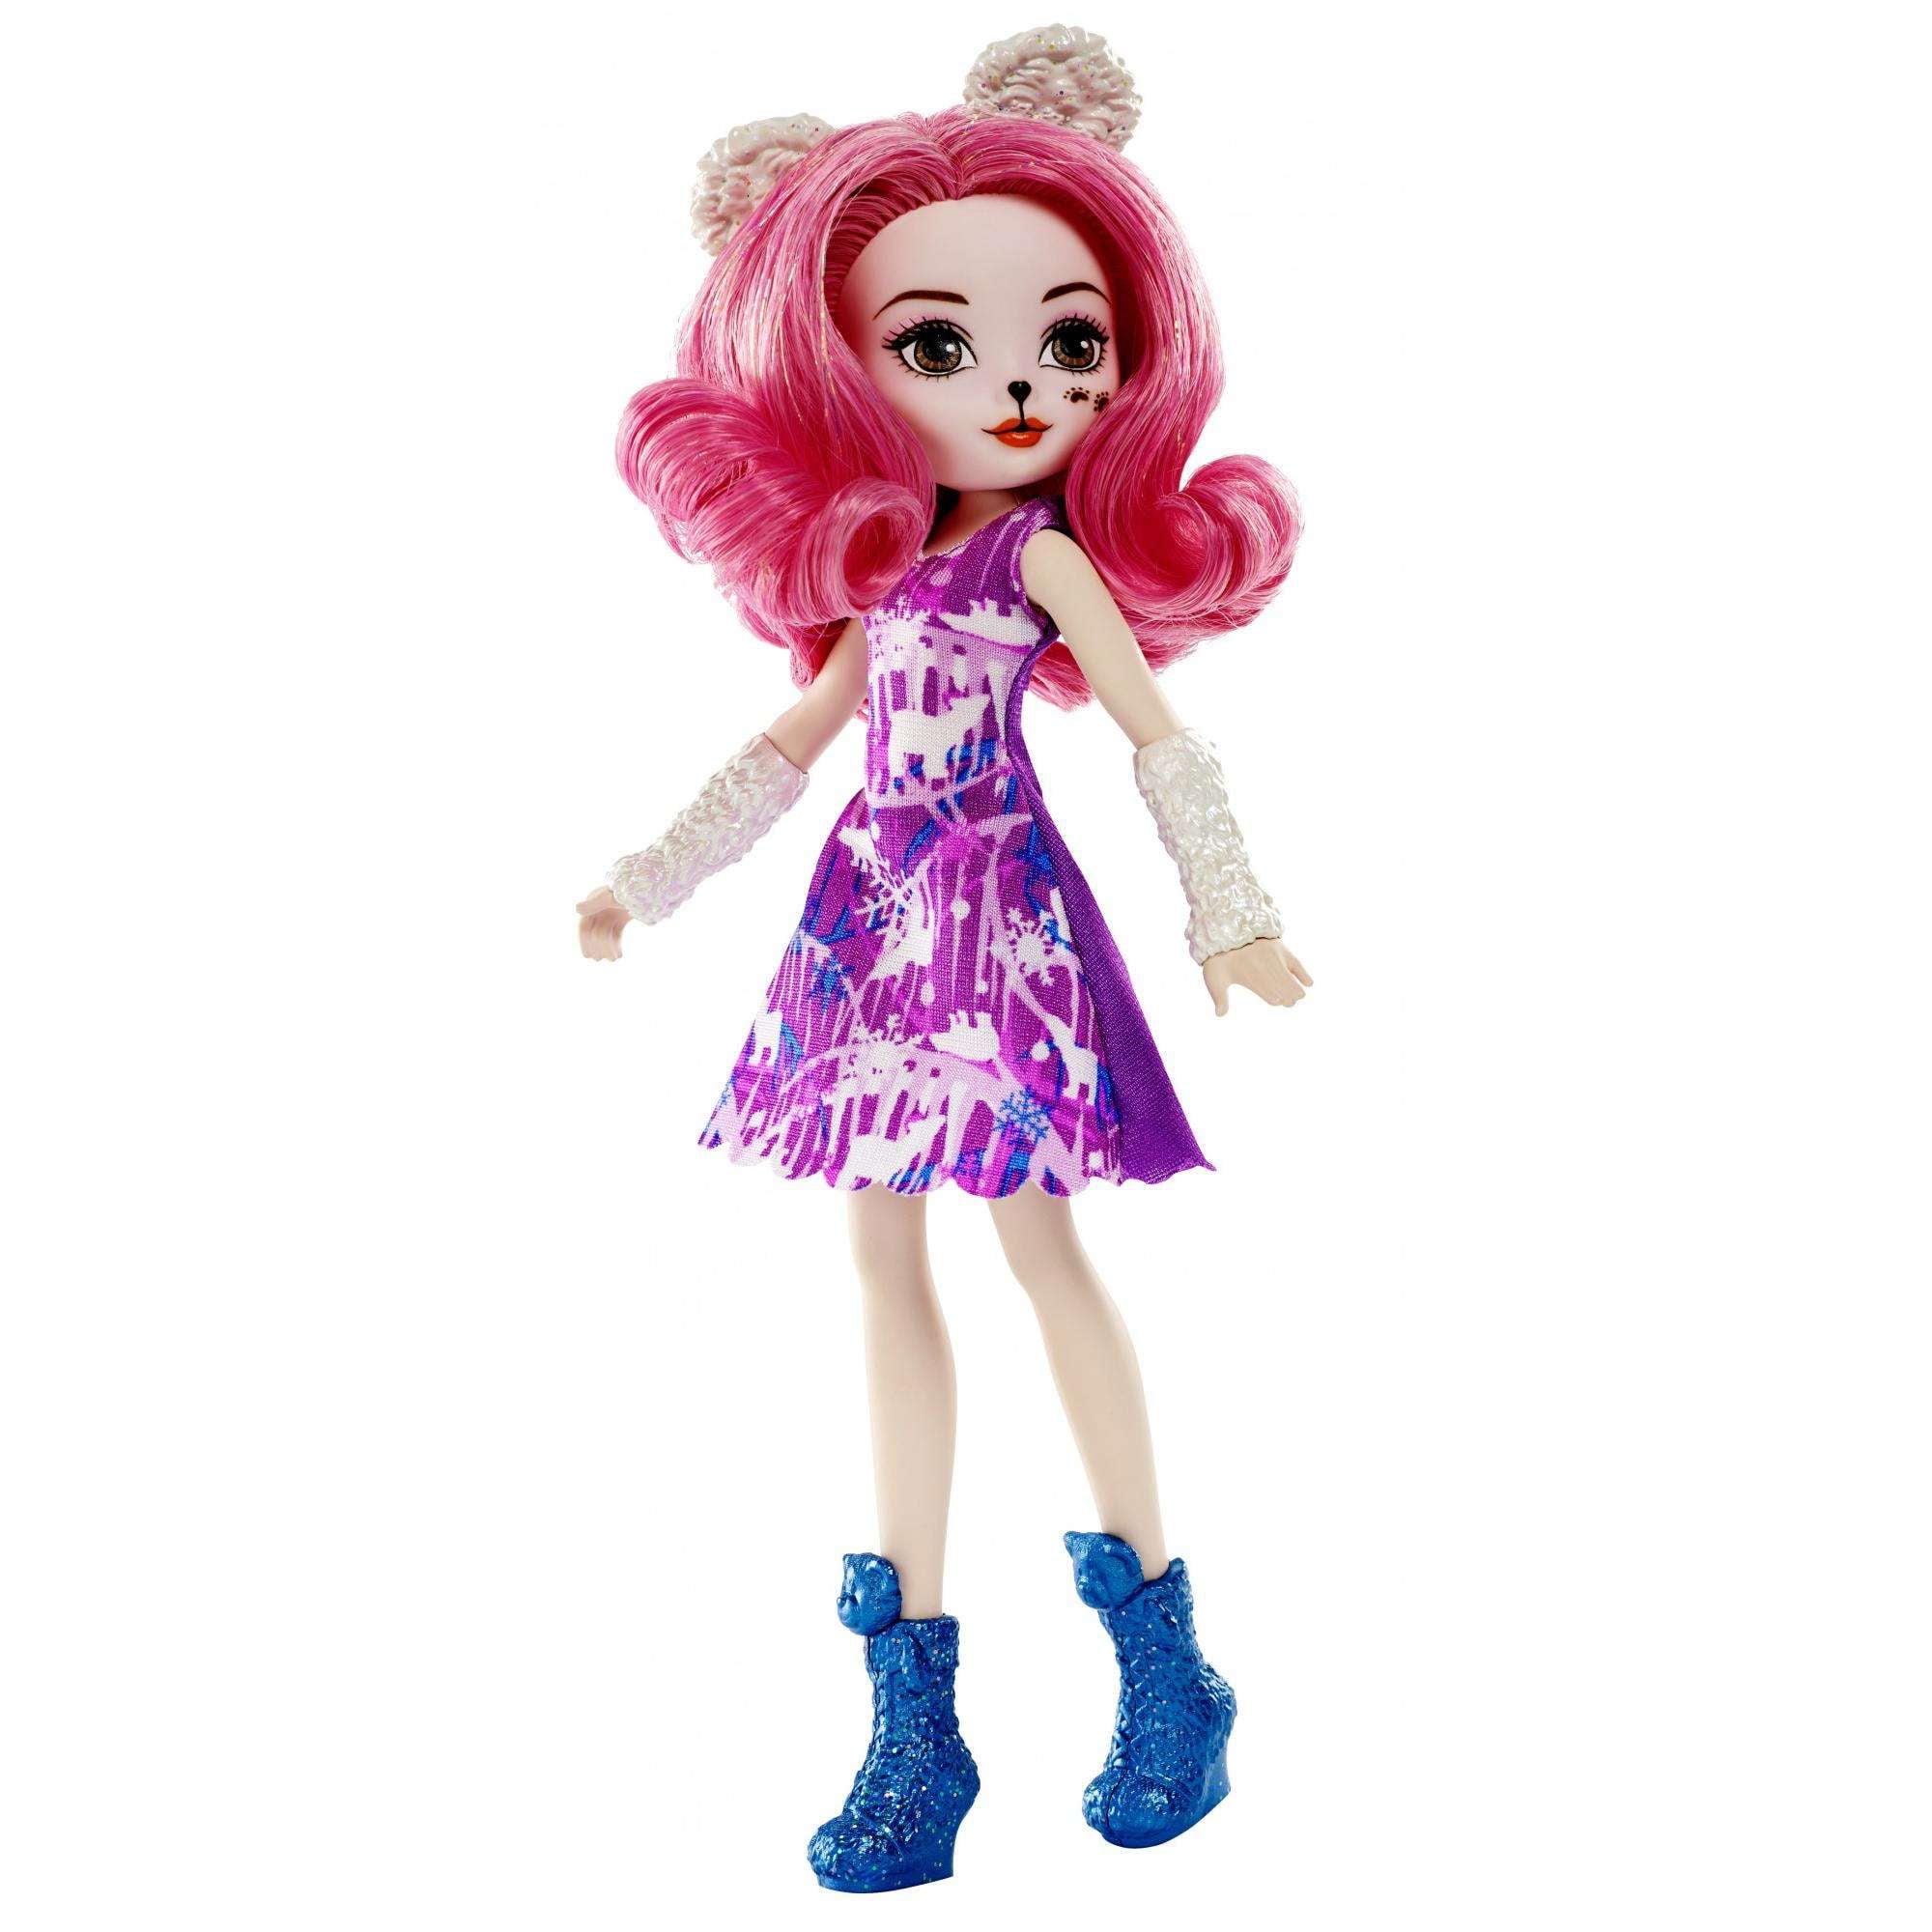 Fisher-Price Ever After High Jillian Beanstalk Doll Replacement Hands Mattel